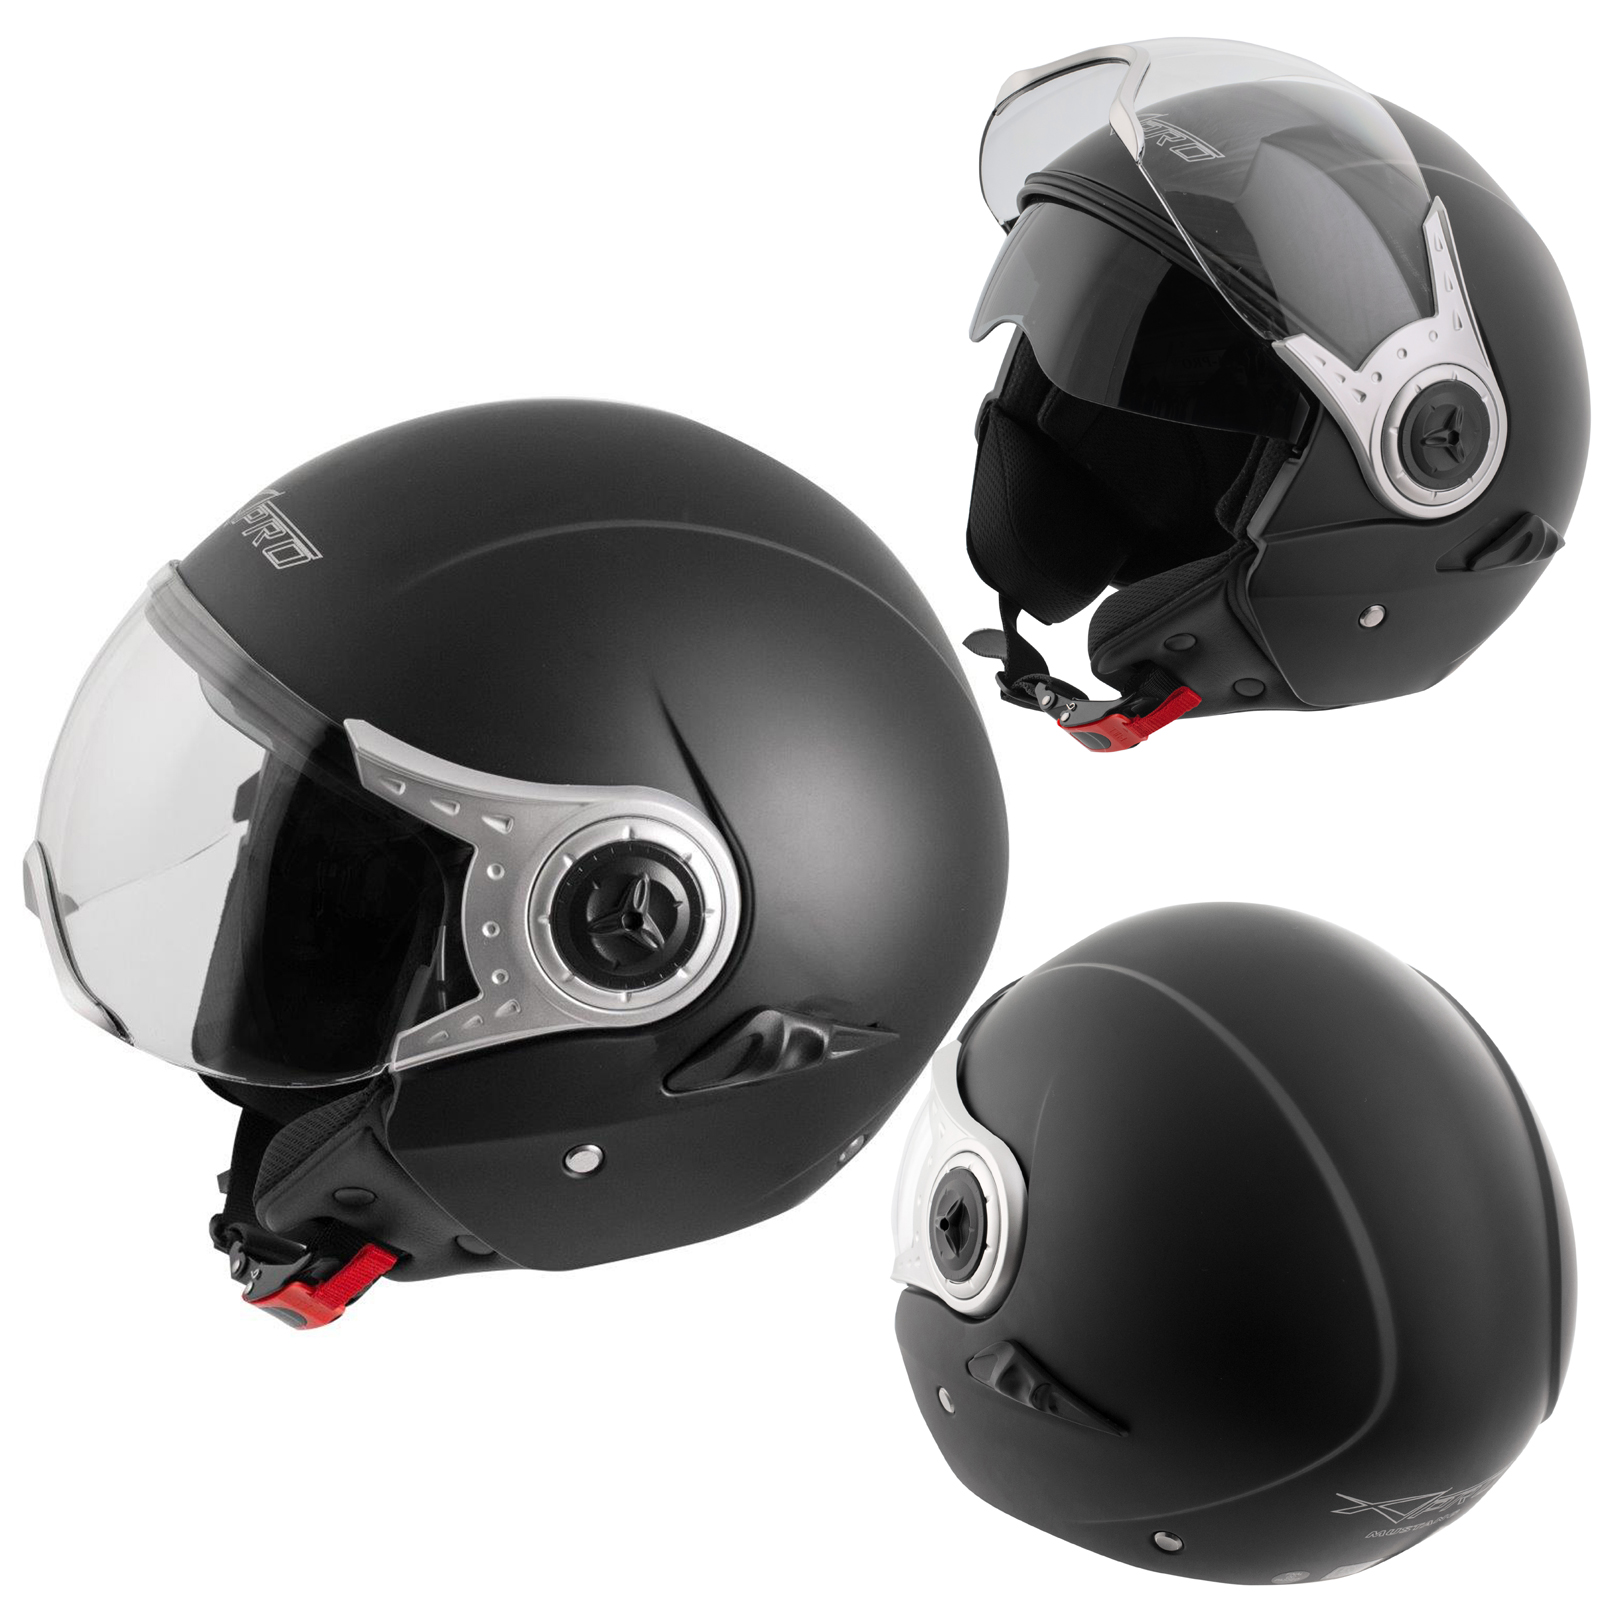 demi jet casque homologu moto scooter visi re pare soleil noir mat ebay. Black Bedroom Furniture Sets. Home Design Ideas